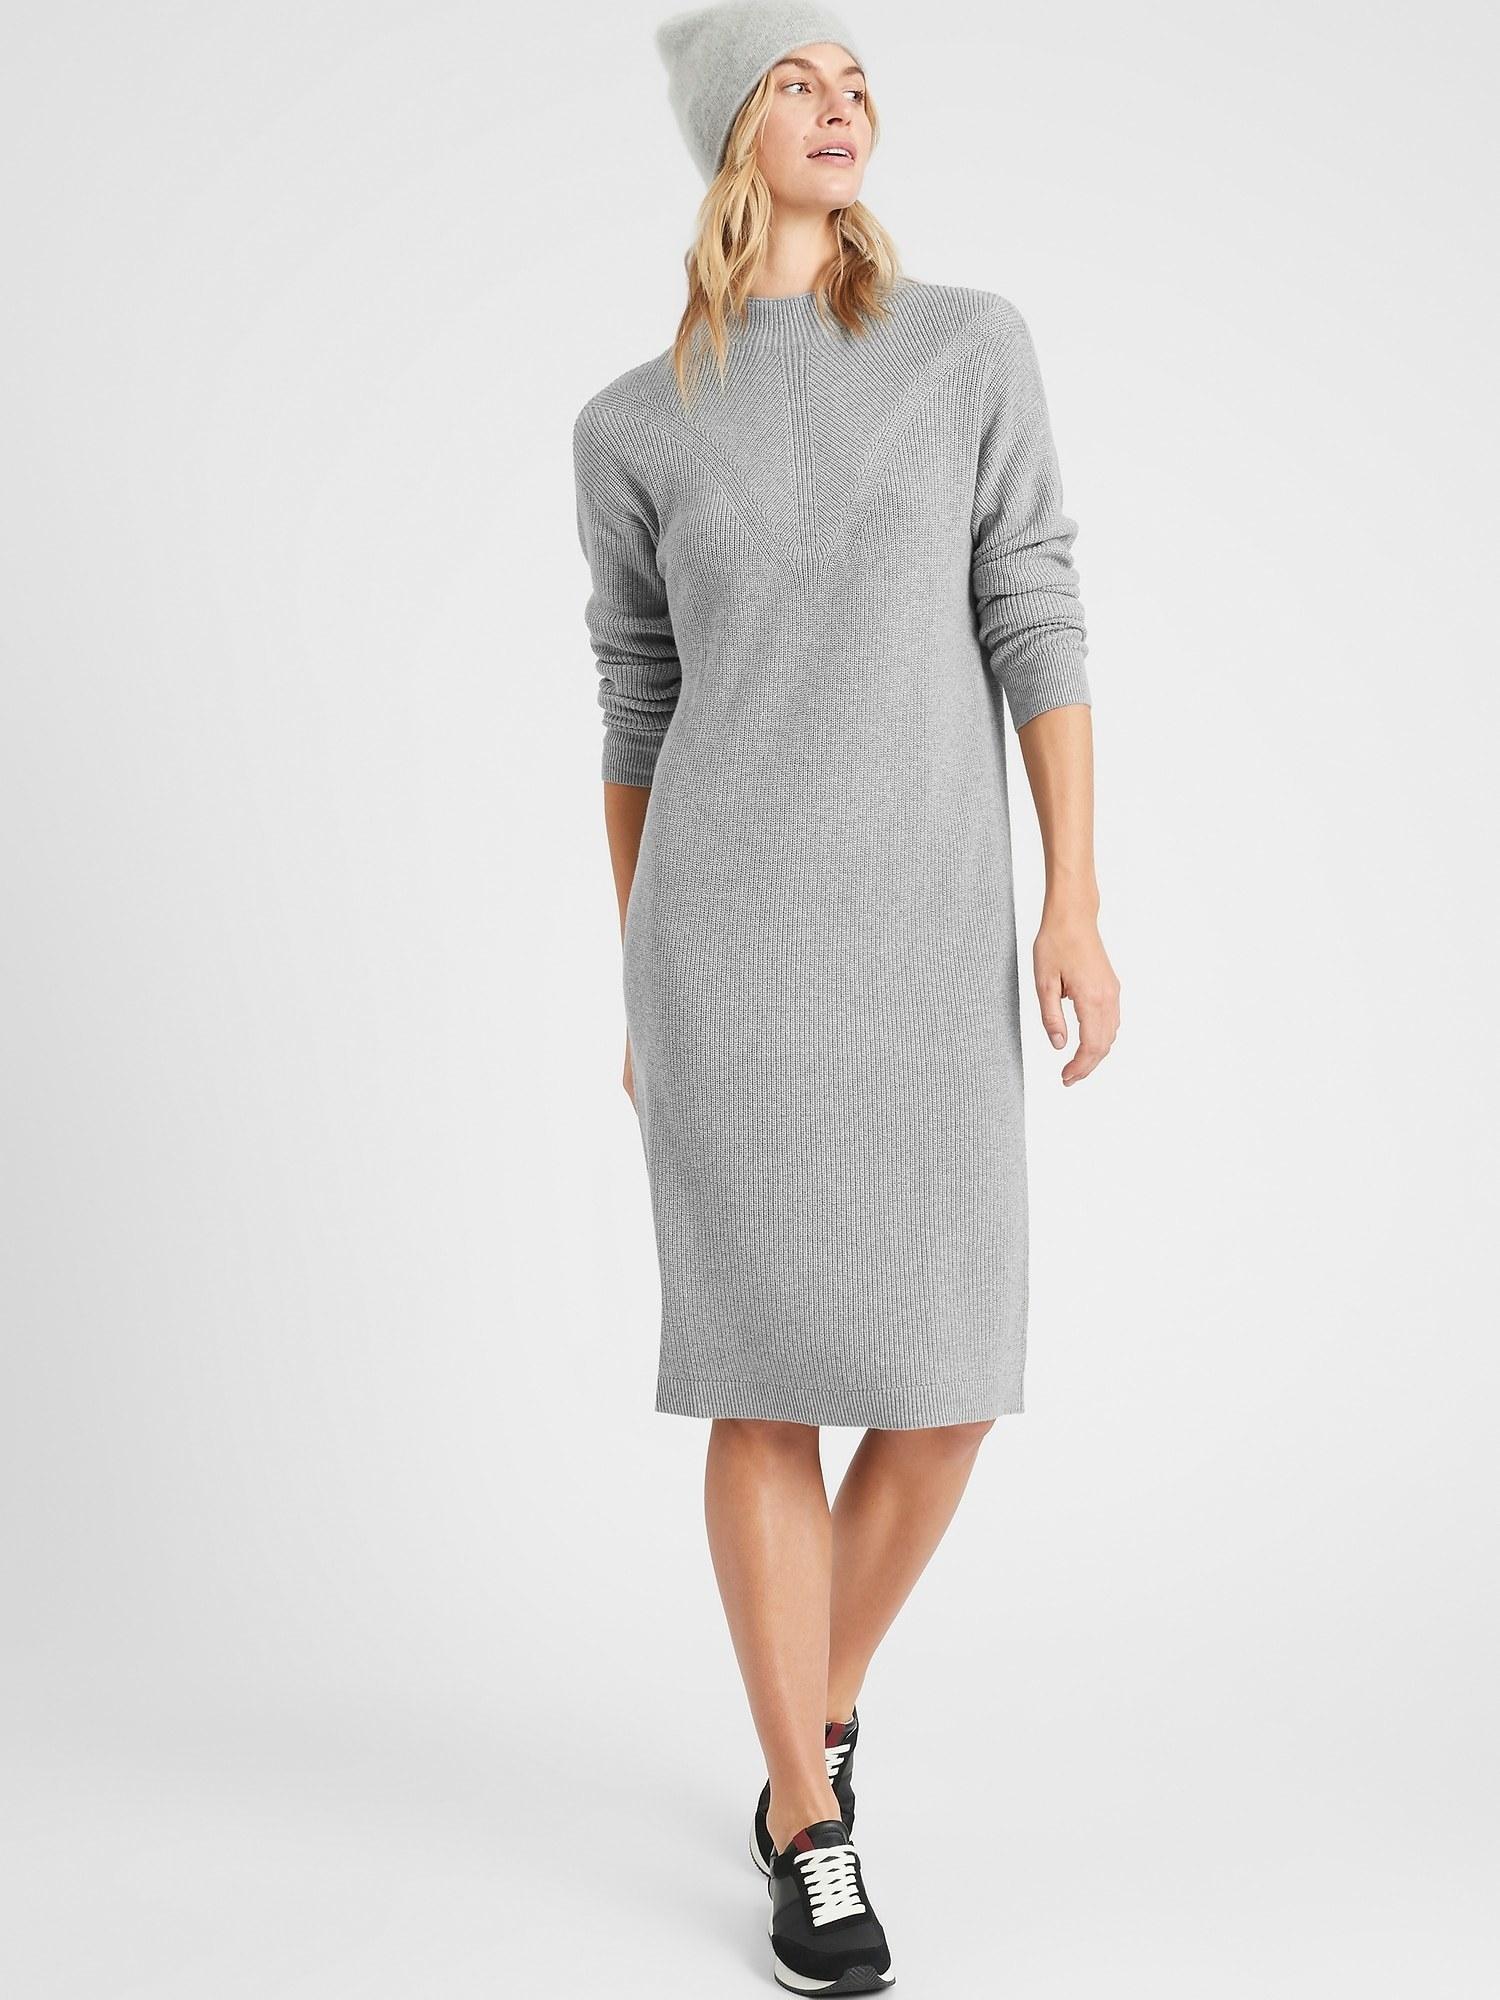 Model in the grey knee-length dress